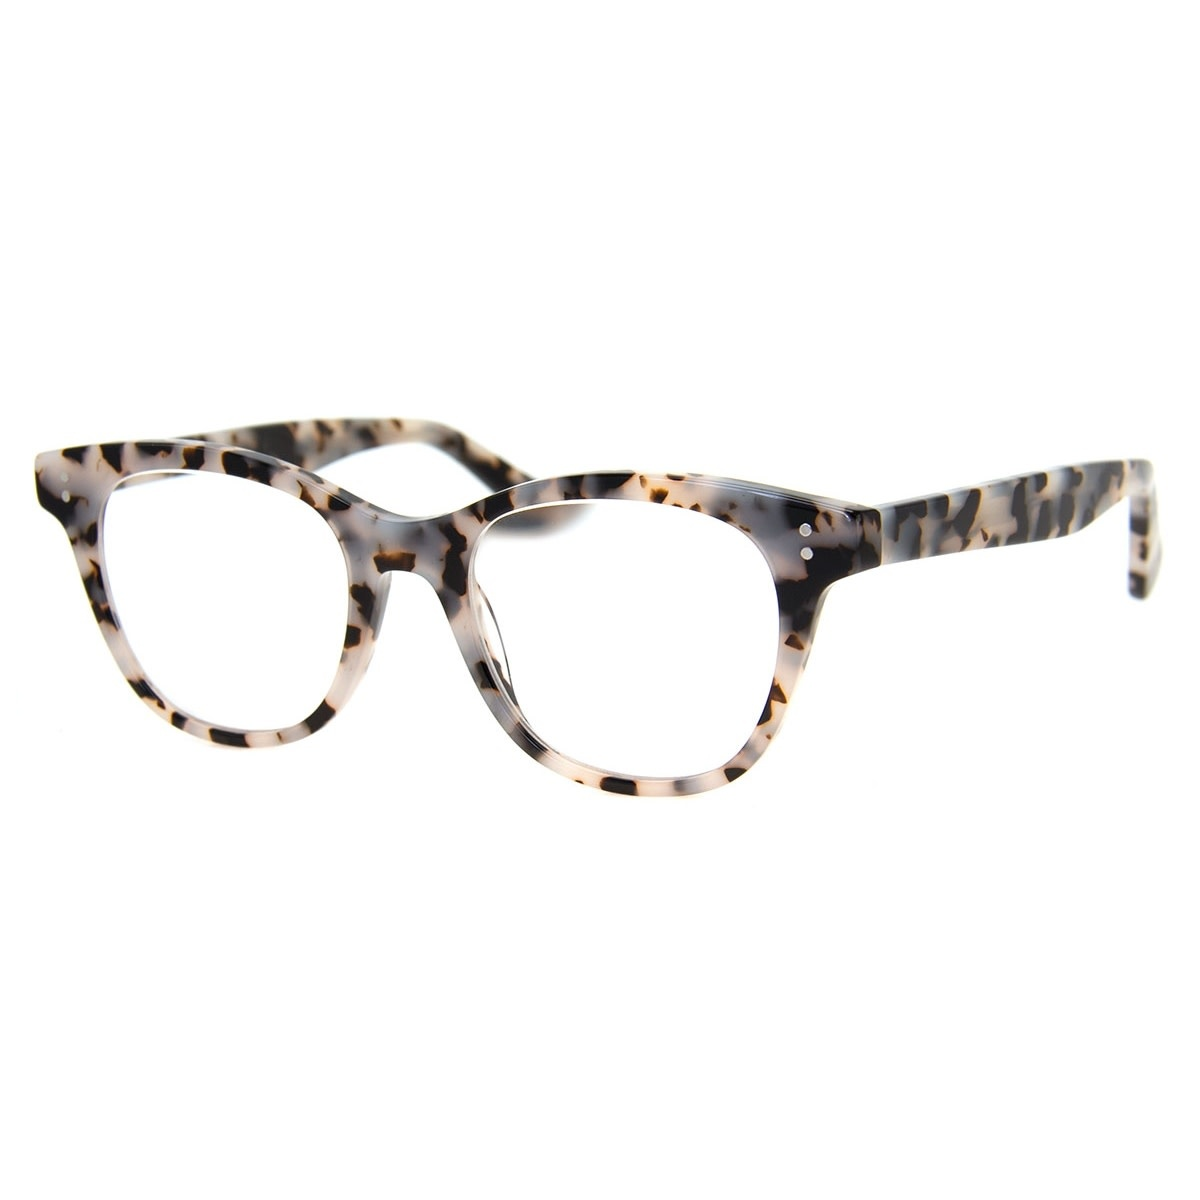 Cuddles - Optical Quality Reading Glasses